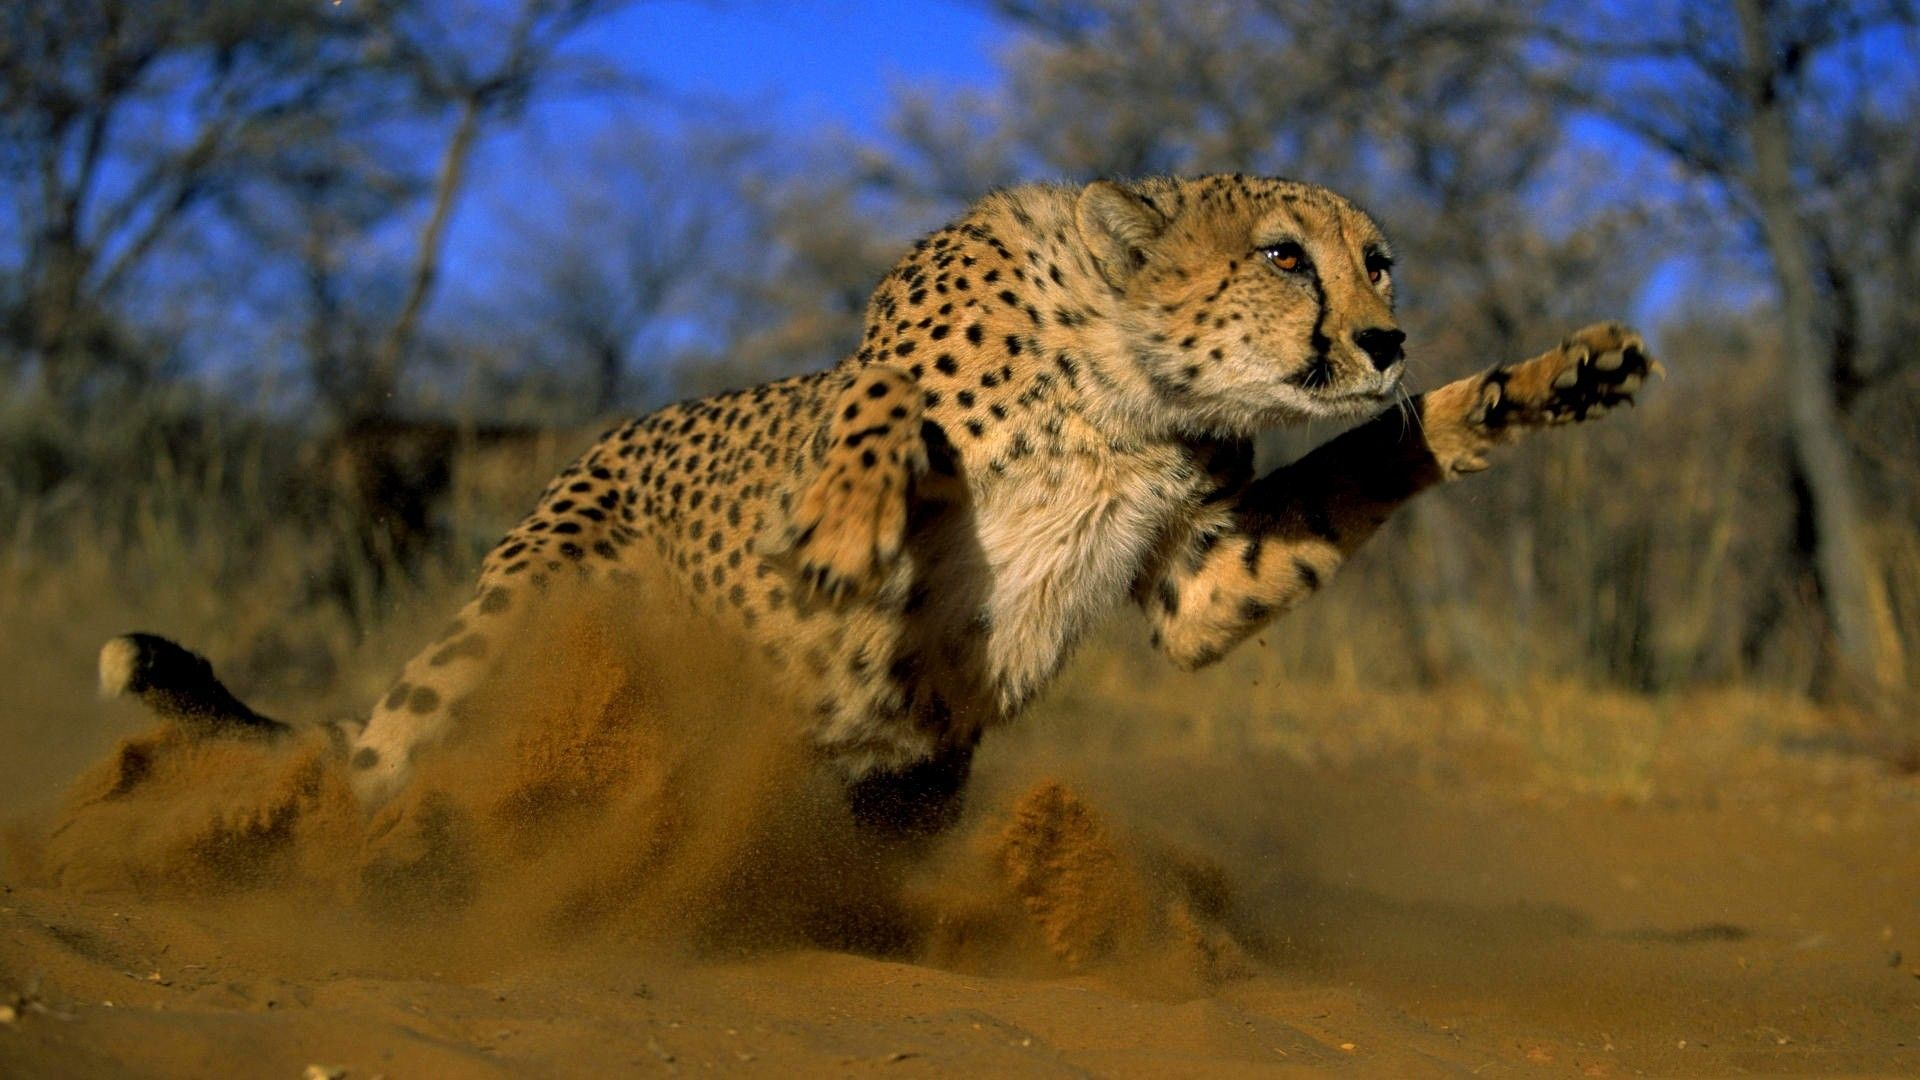 Running Cheetah Running Hd Wallpapers Smashing Hd Wallpapers